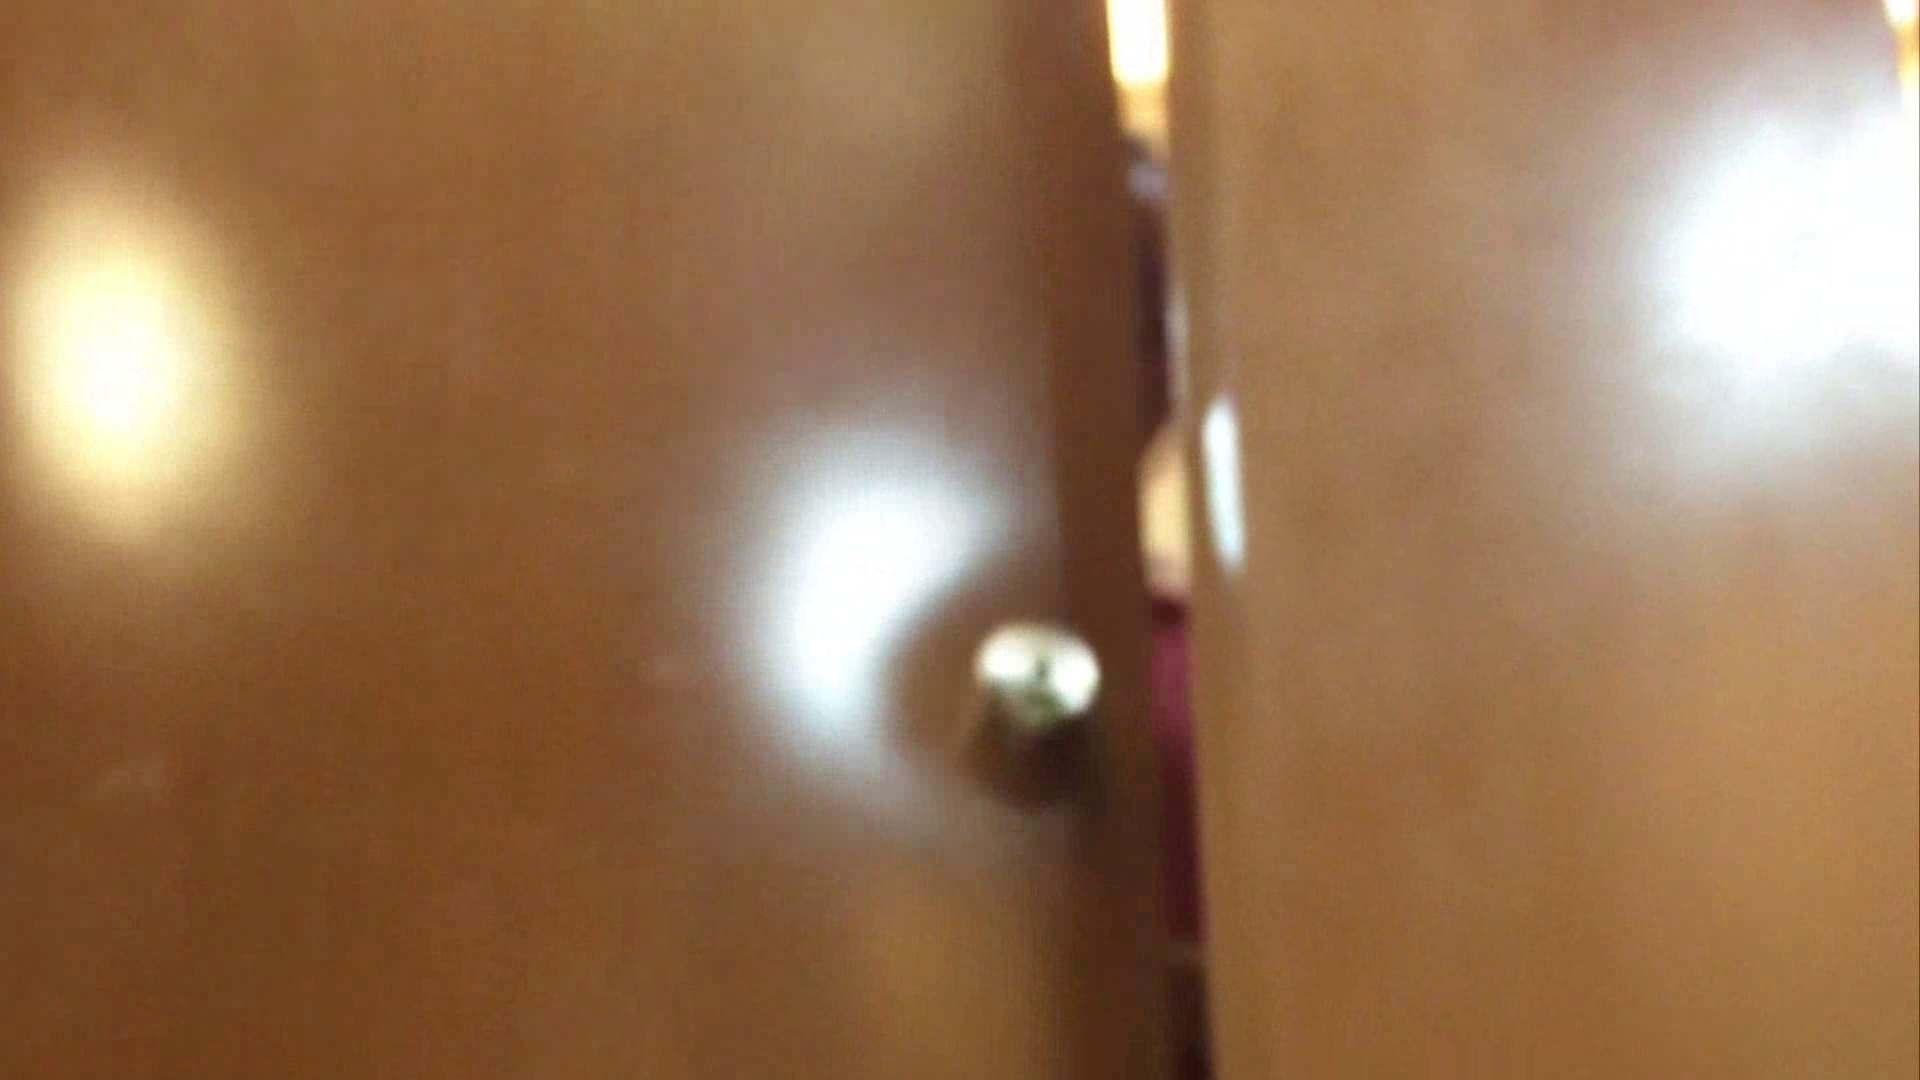 隣国化粧室下から御免!! No.15 洗面所 | 美女H映像  103画像 18